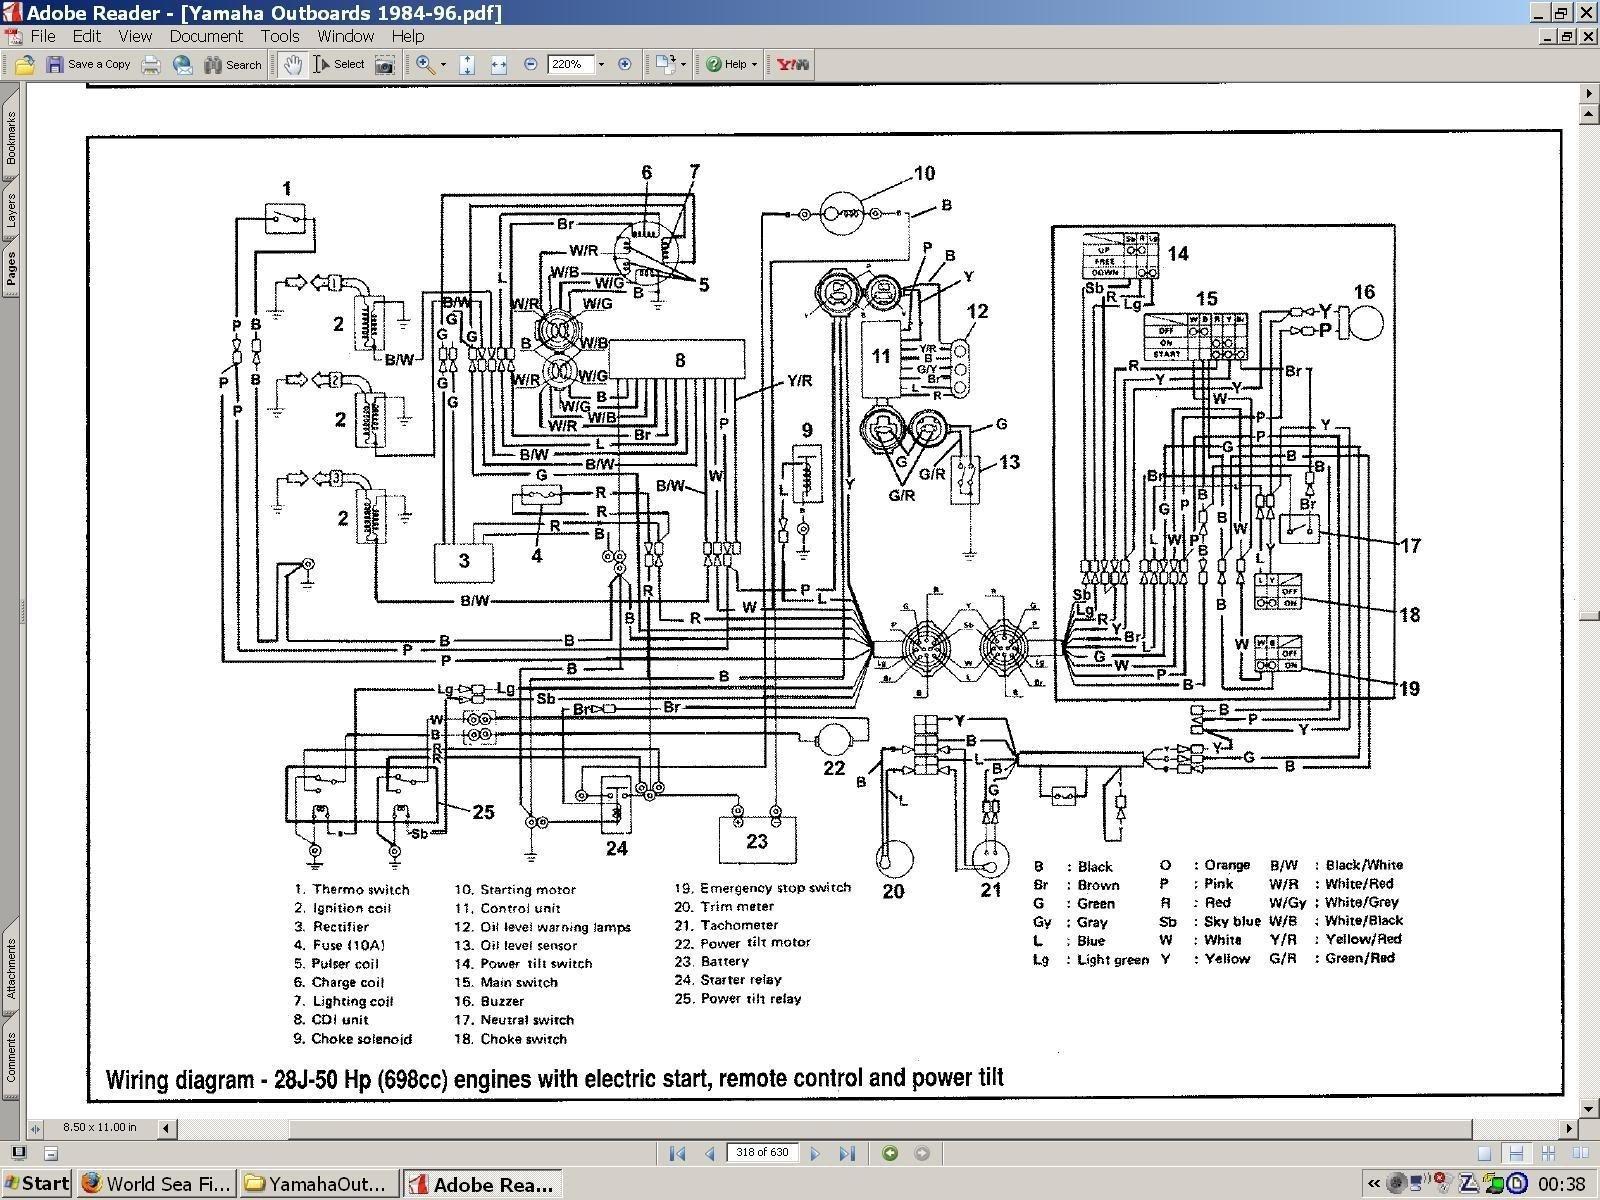 9 Pin Wiring Harness Yamaha - Wiring Diagram Schematics  Stroke Wiring Harness on 4 stroke exhaust, 4 stroke engine timing, 4 stroke tuning, 4 stroke fuel injection, 4 stroke spark plug color, 4 stroke diagram, 4 stroke motor, 4 stroke engine firing order,